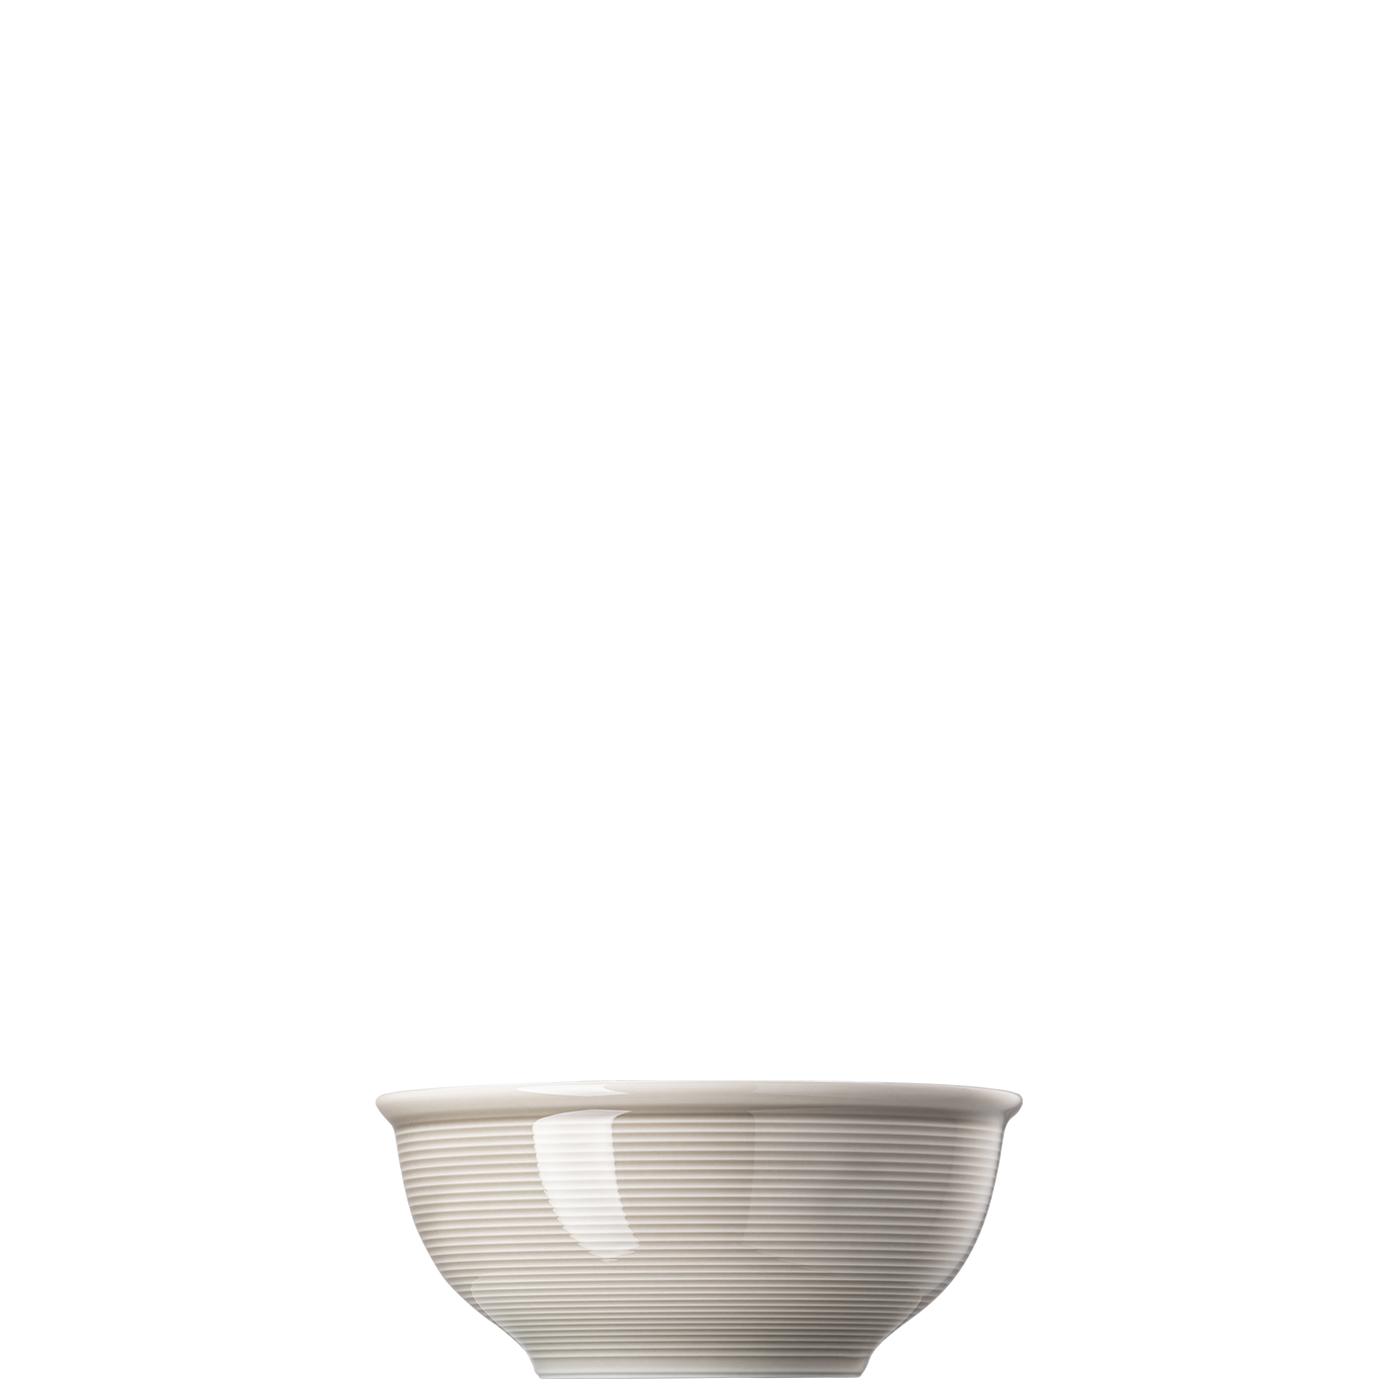 Müslischale 16 cm Trend Colour Moon Grey Thomas Porzellan